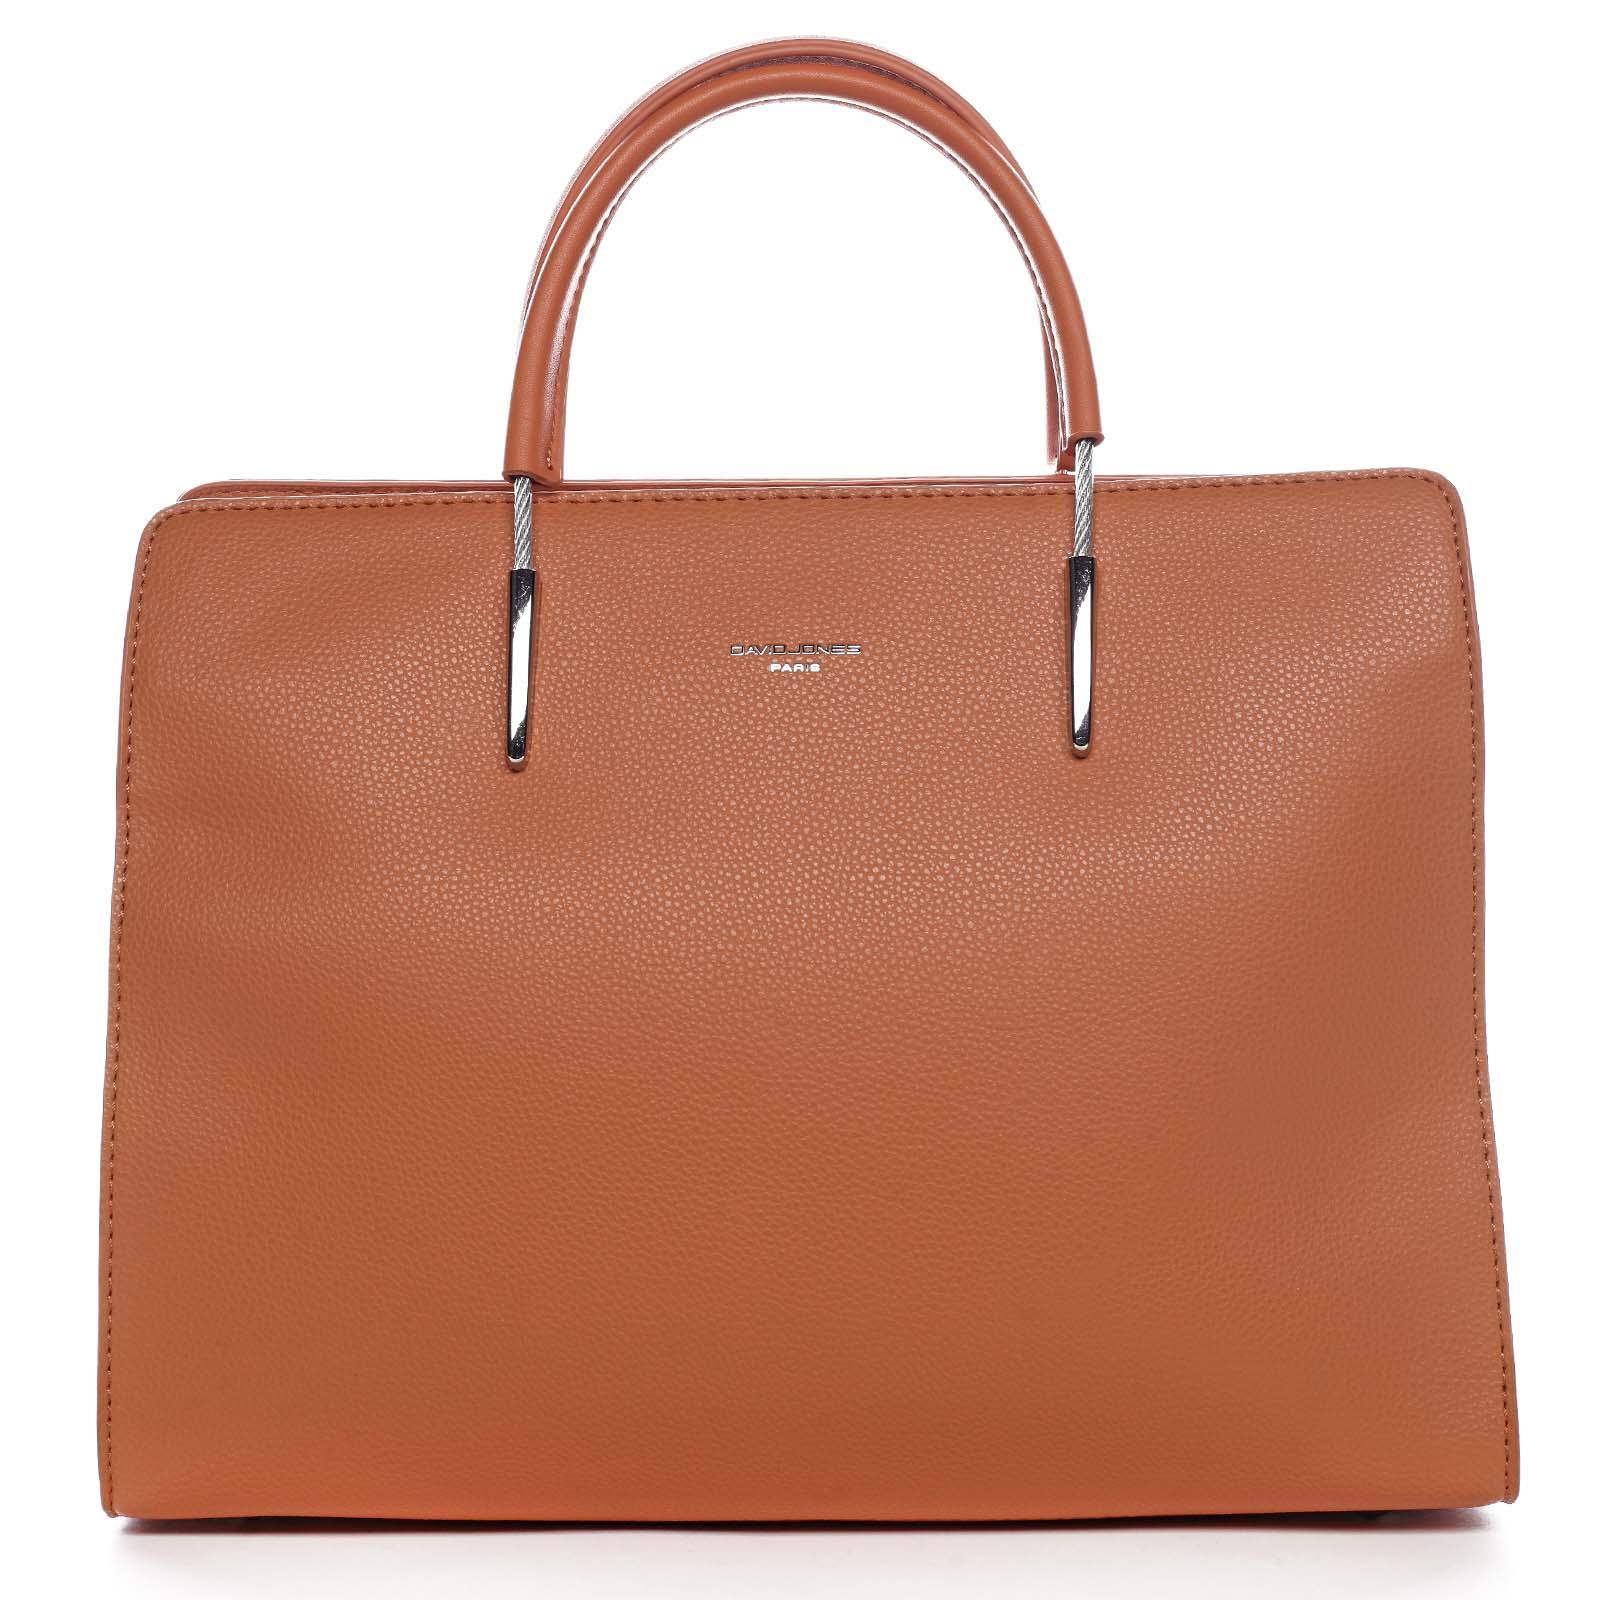 Dámska kabelka do ruky oranžová - David Jones Miracle